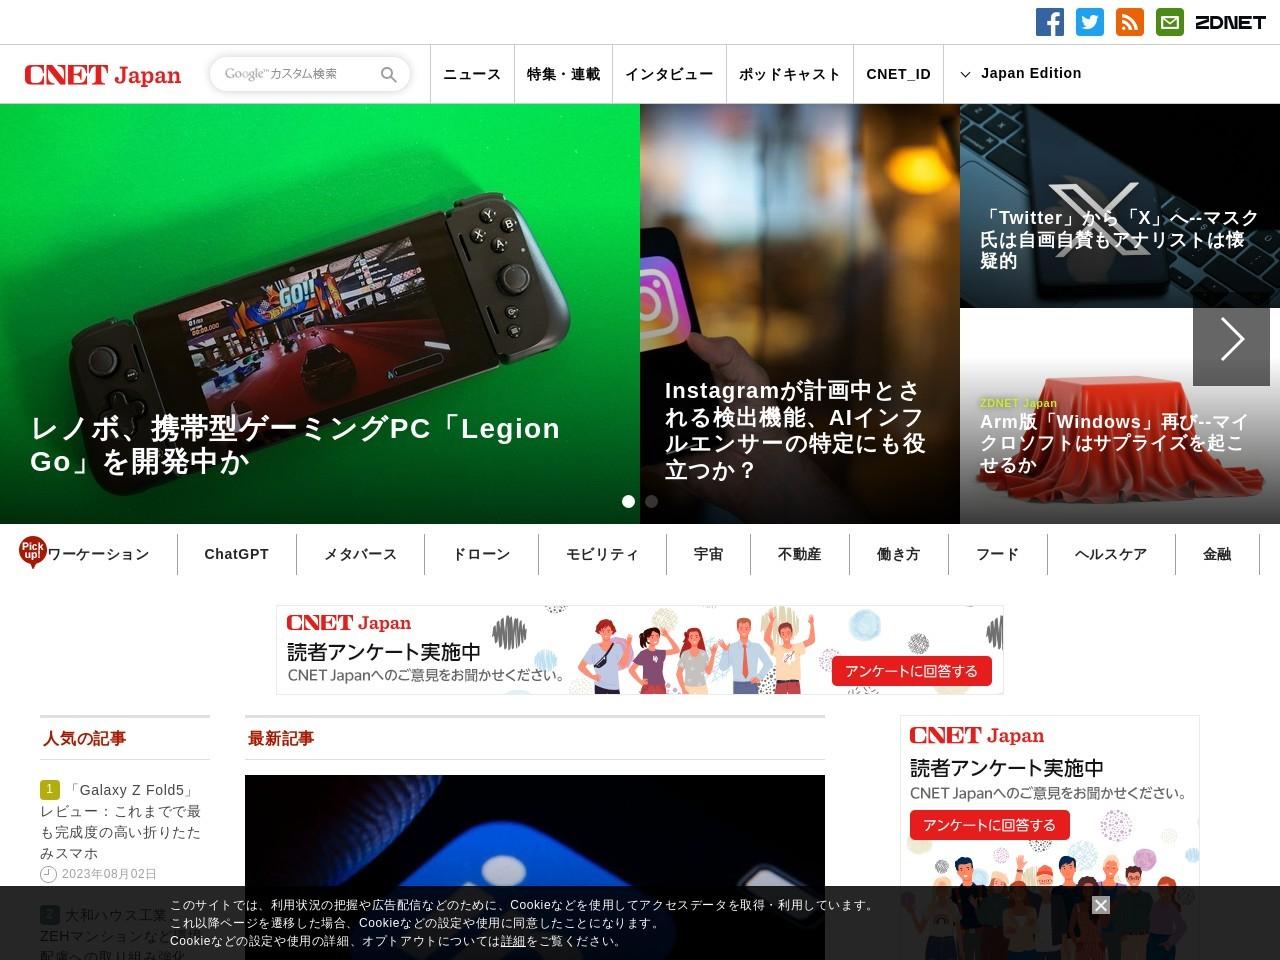 NTTドコモ、夏の新端末とサービスを発表−−分離プラン向け端末購入プログラムも - CNET Japan